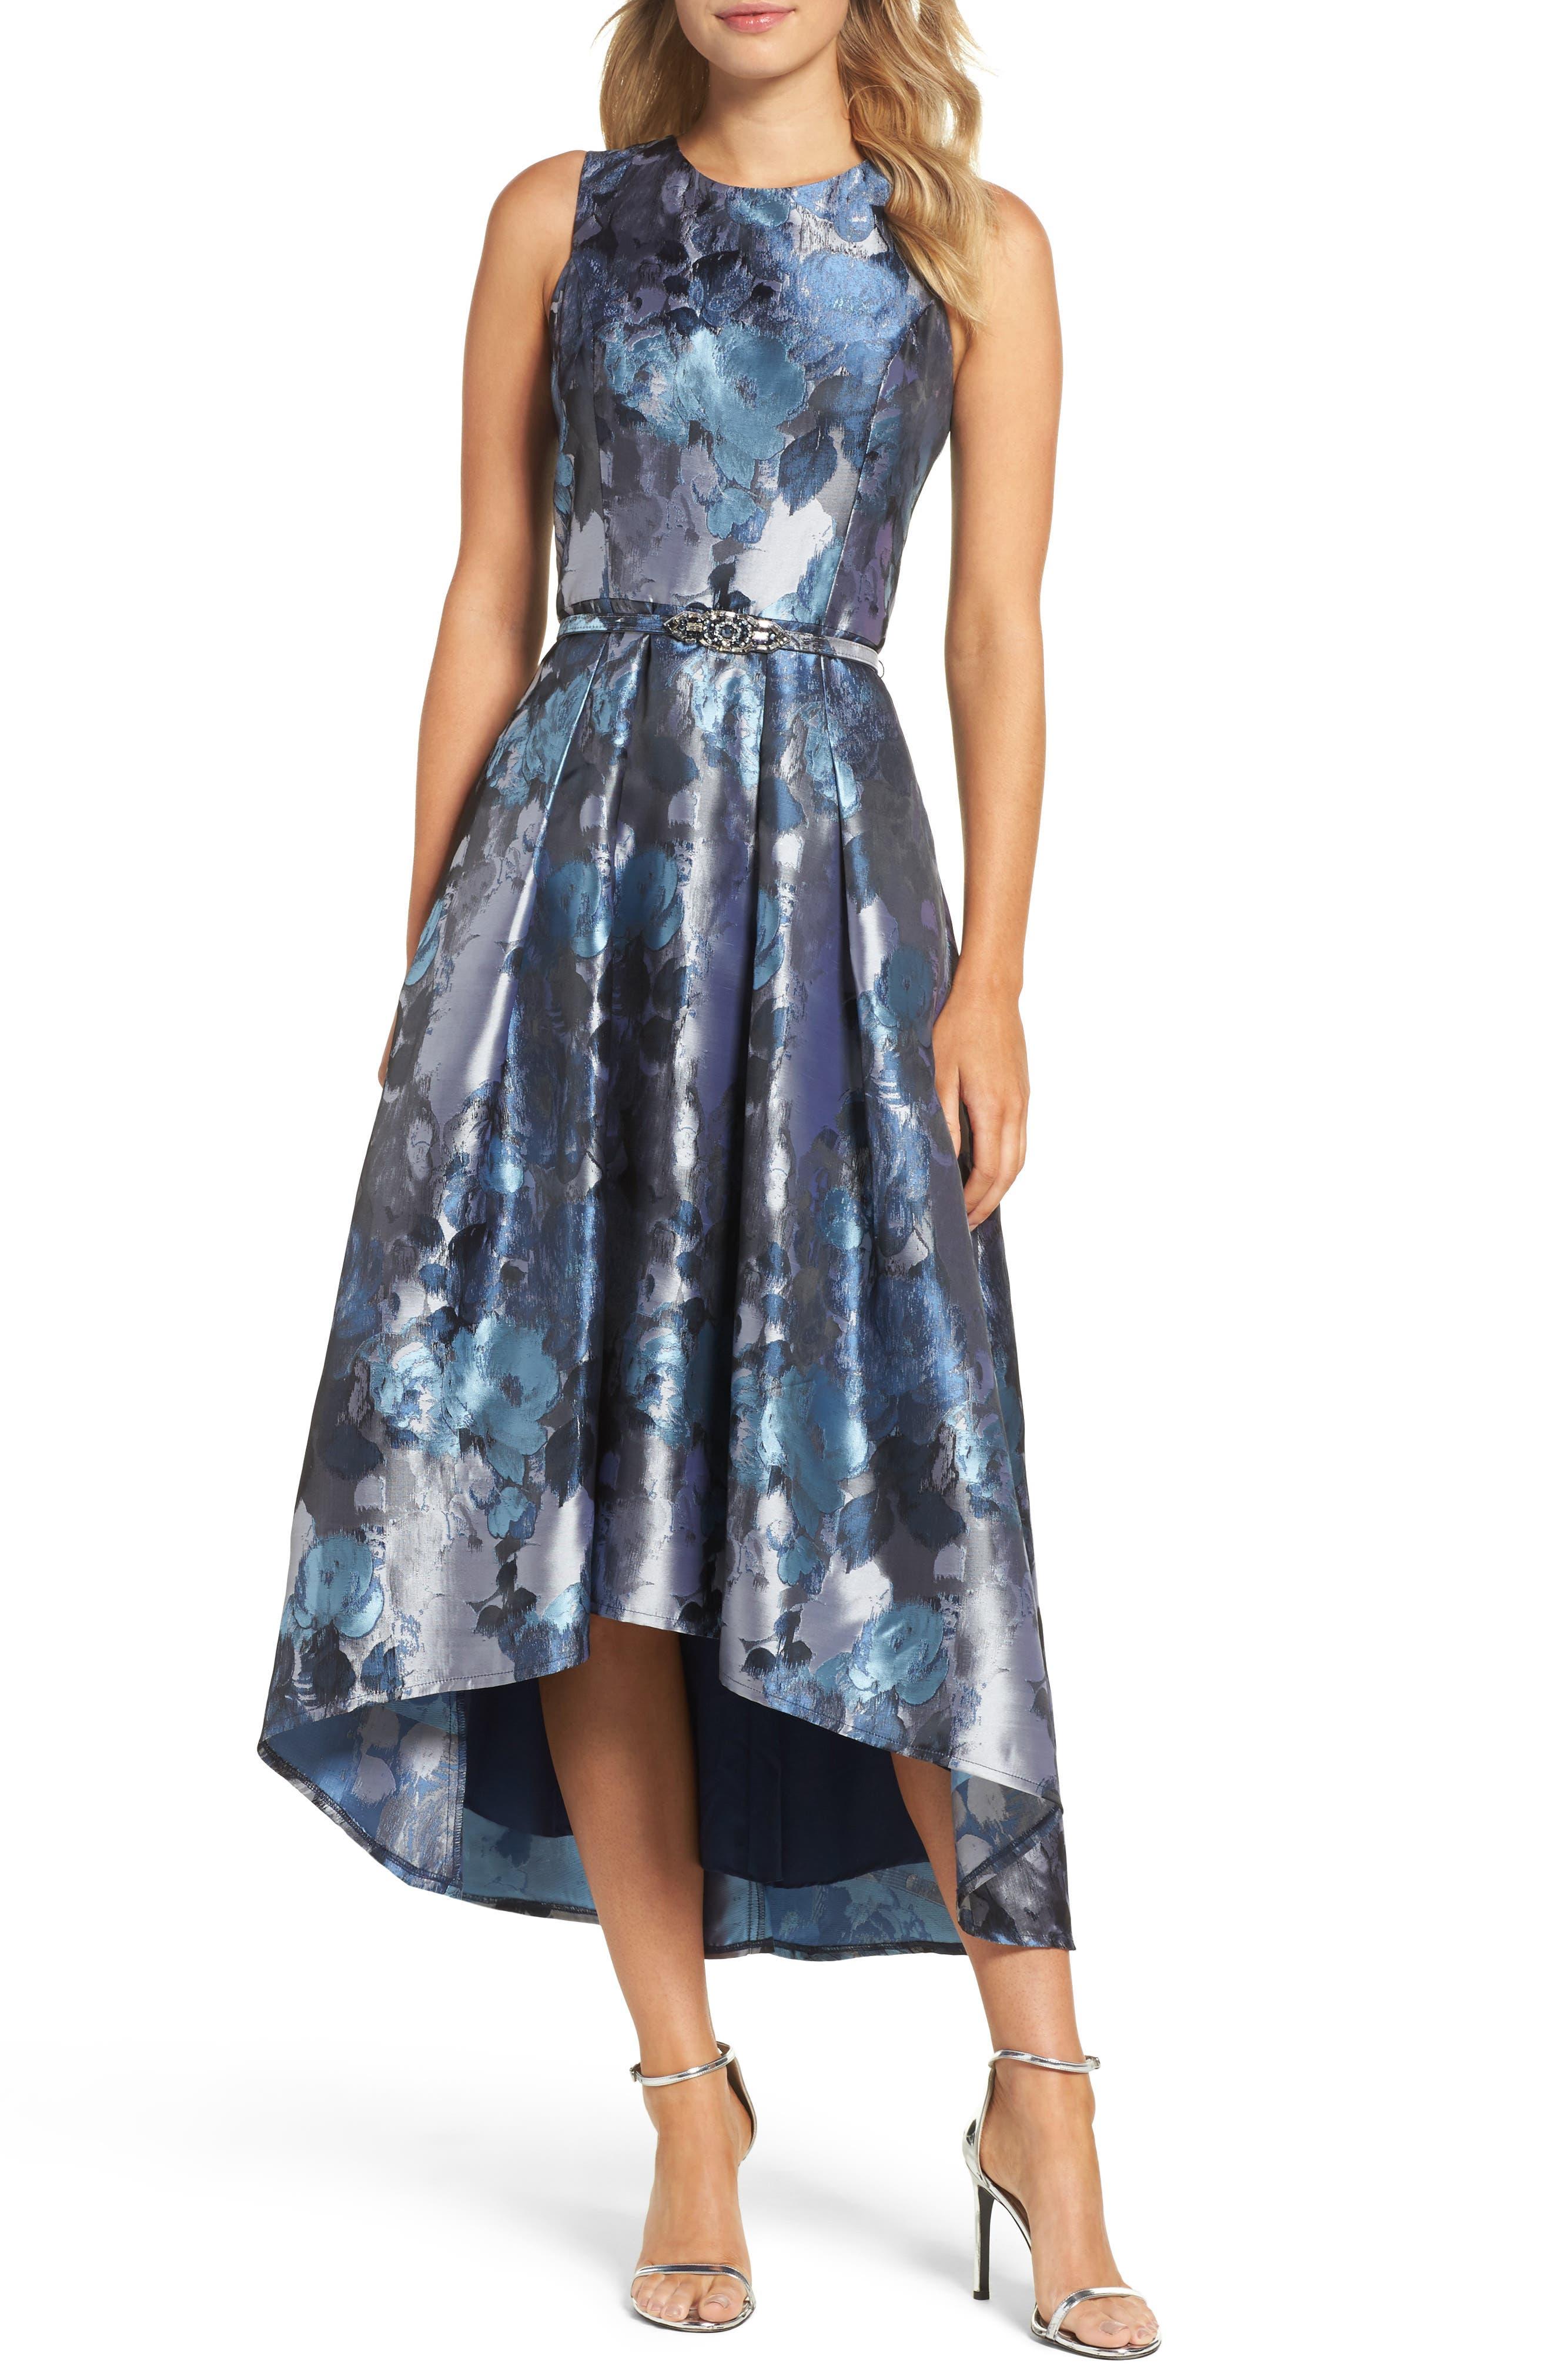 Alternate Image 1 Selected - Eliza J Jacquard High/Low Dress